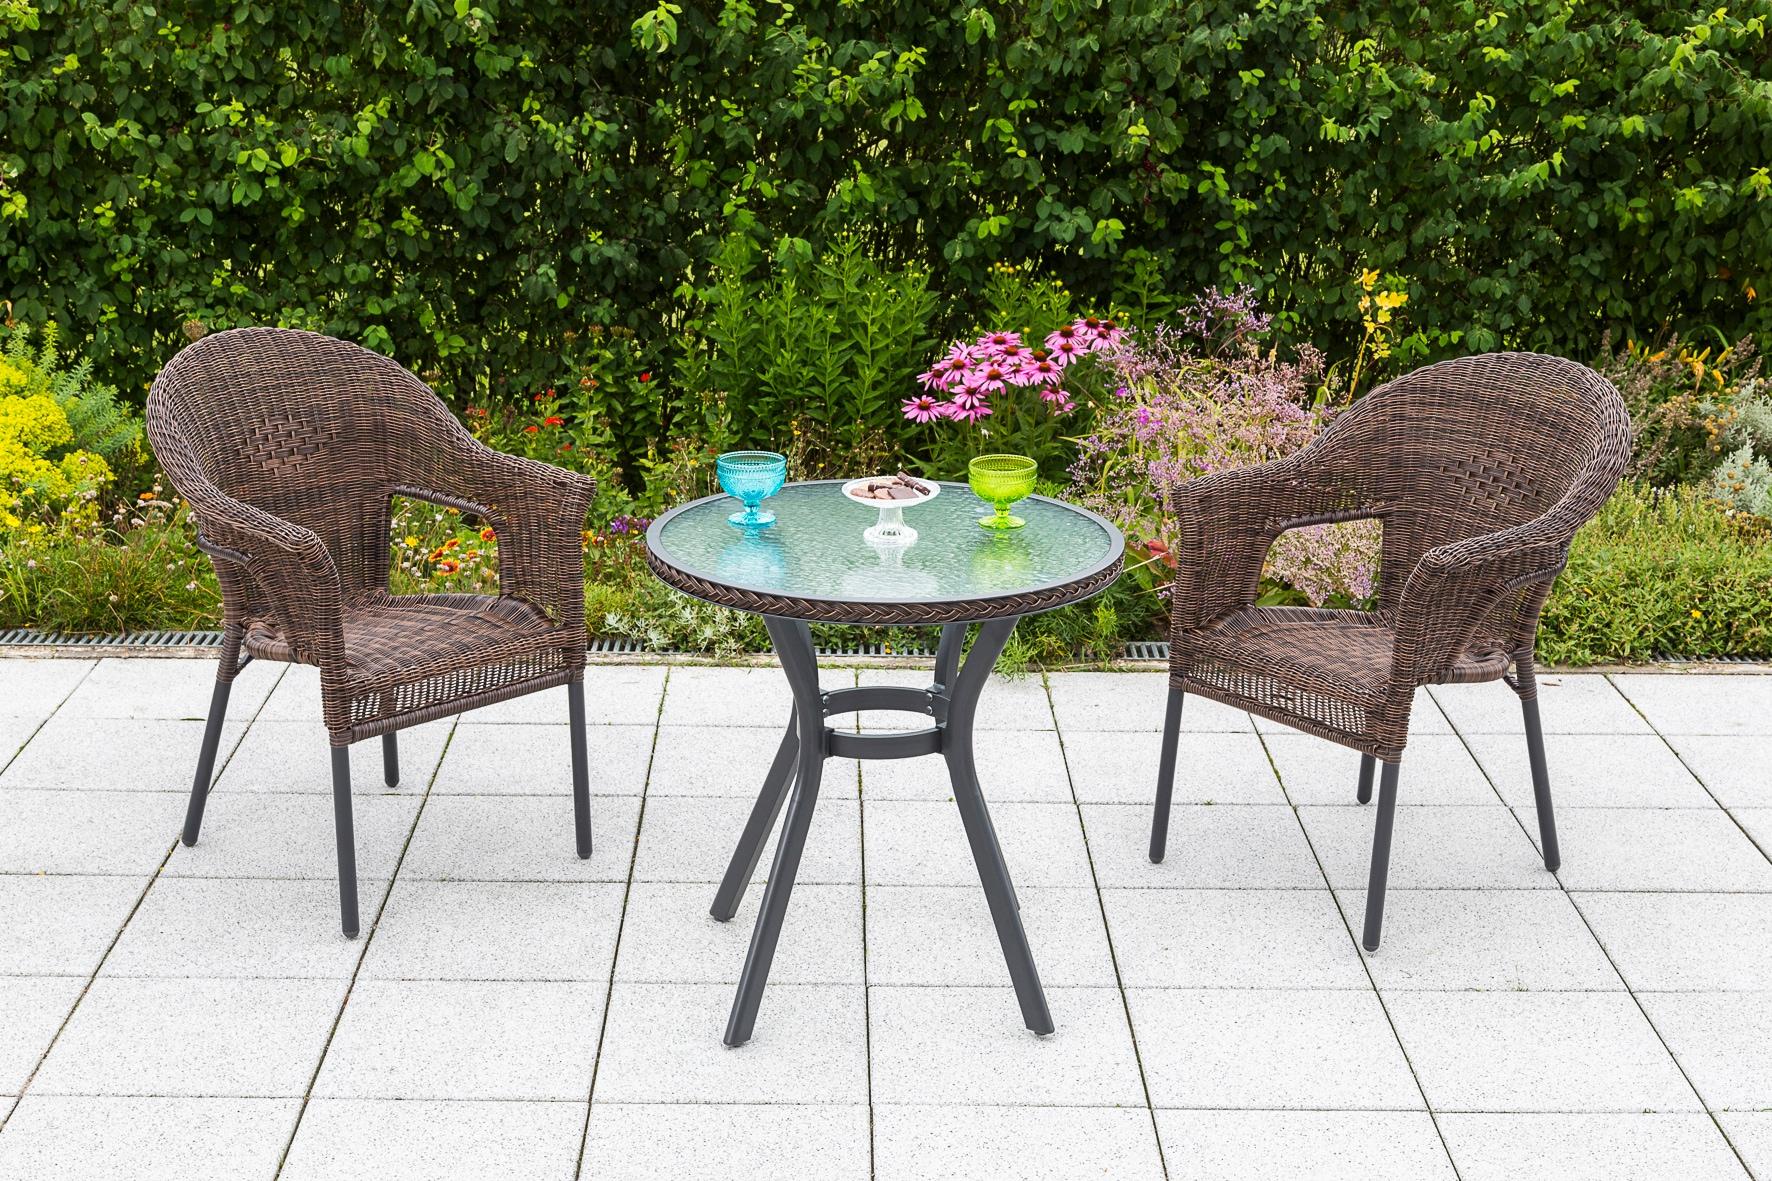 MERXX Gartenmöbelset Ravenna 3tlg 2 Sessel Tisch stapelbar Polyrattan